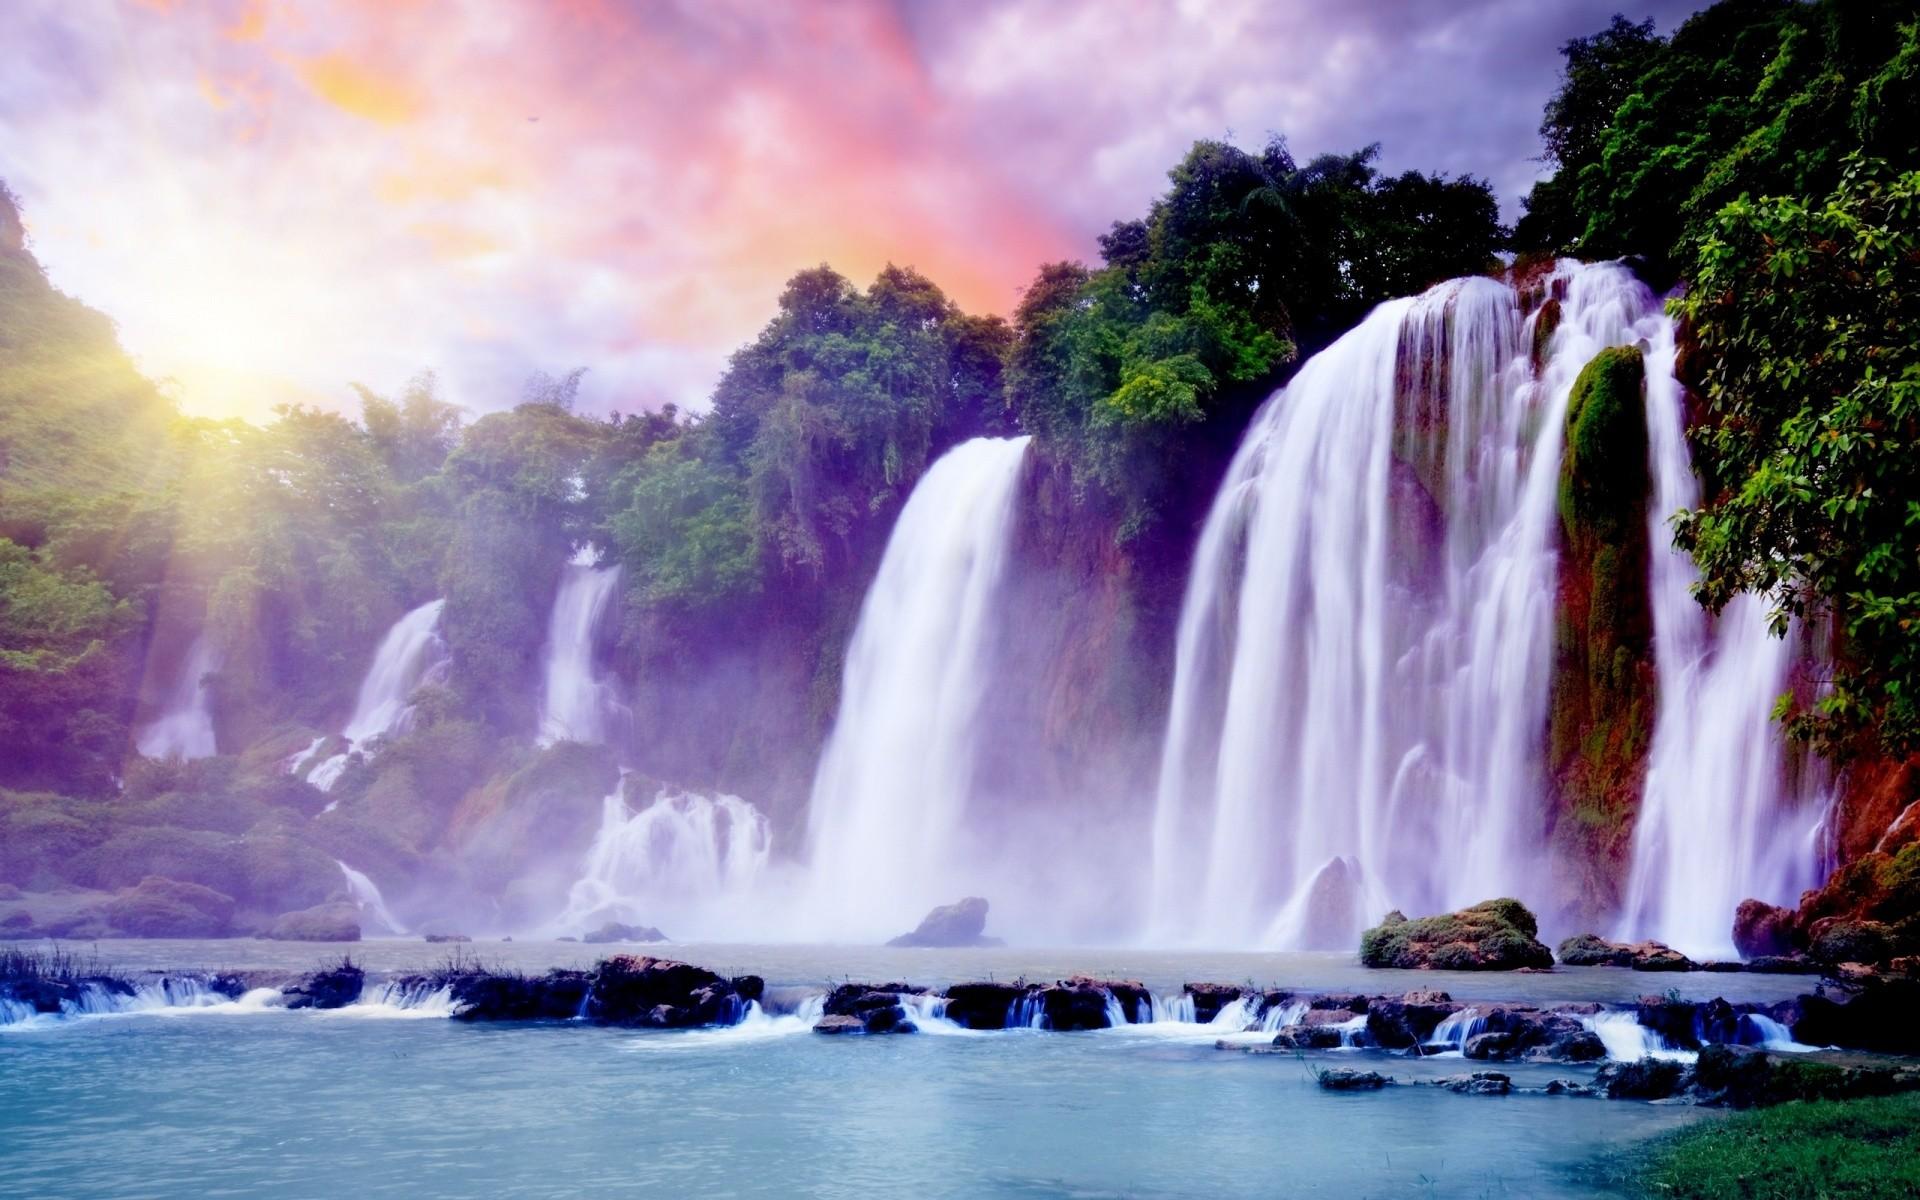 Waterfalls HD Wallpapers: Find best latest Waterfalls HD Wallpapers for  your PC desktop background &